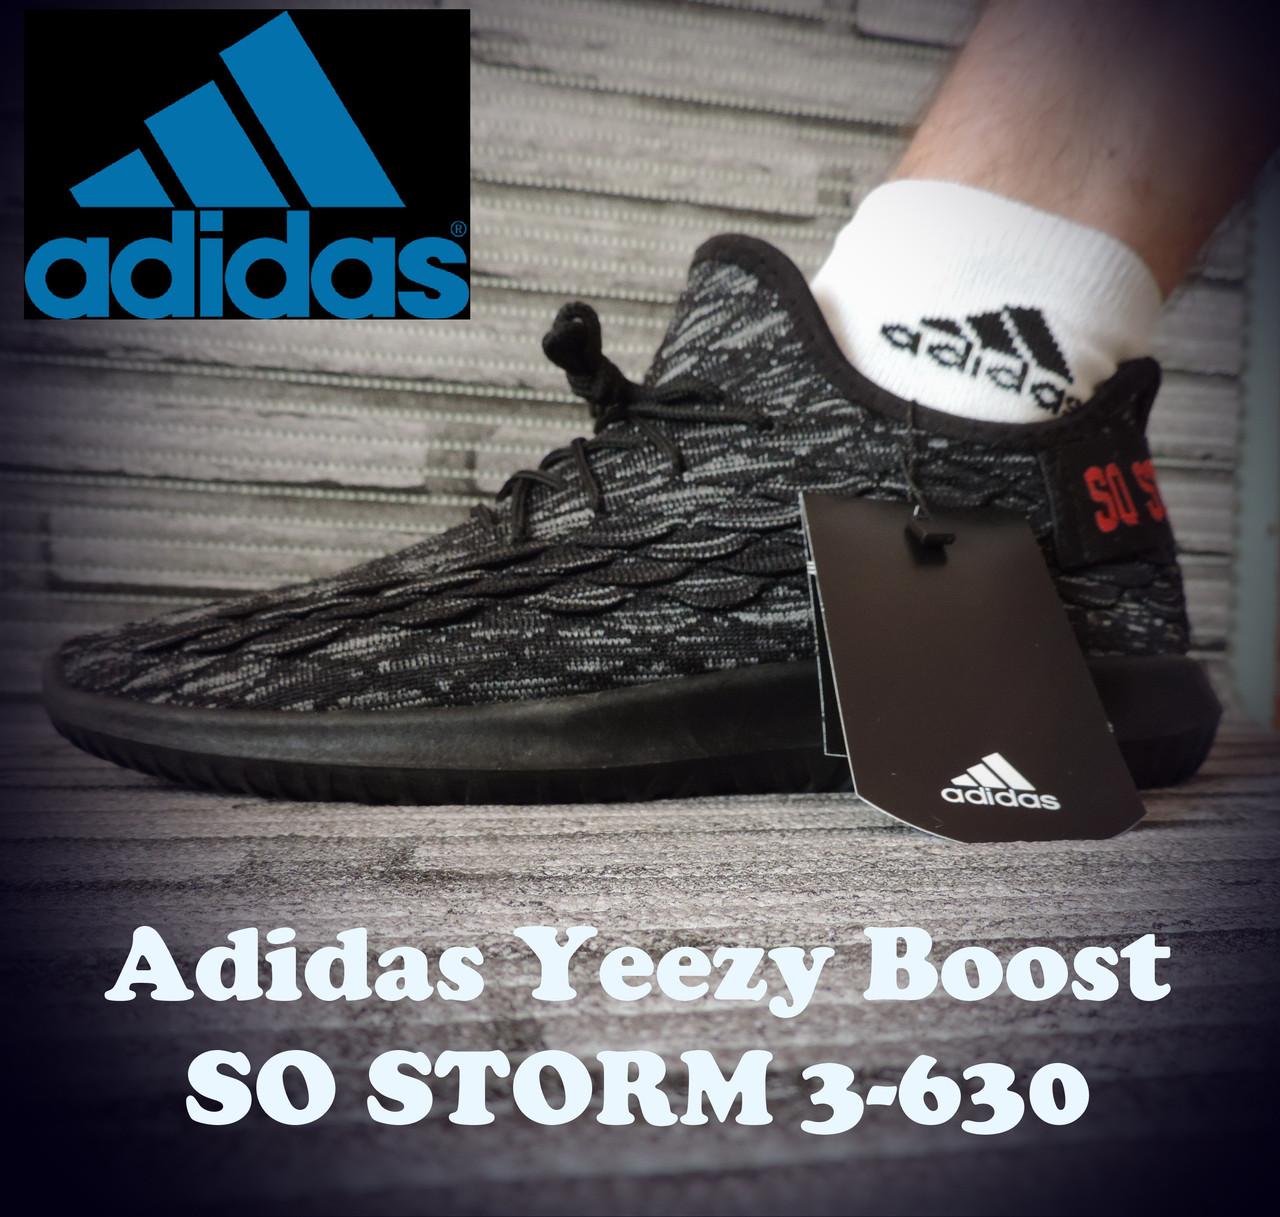 Кроссовки  Adidas Yeezy Boost So Storm 3-630.